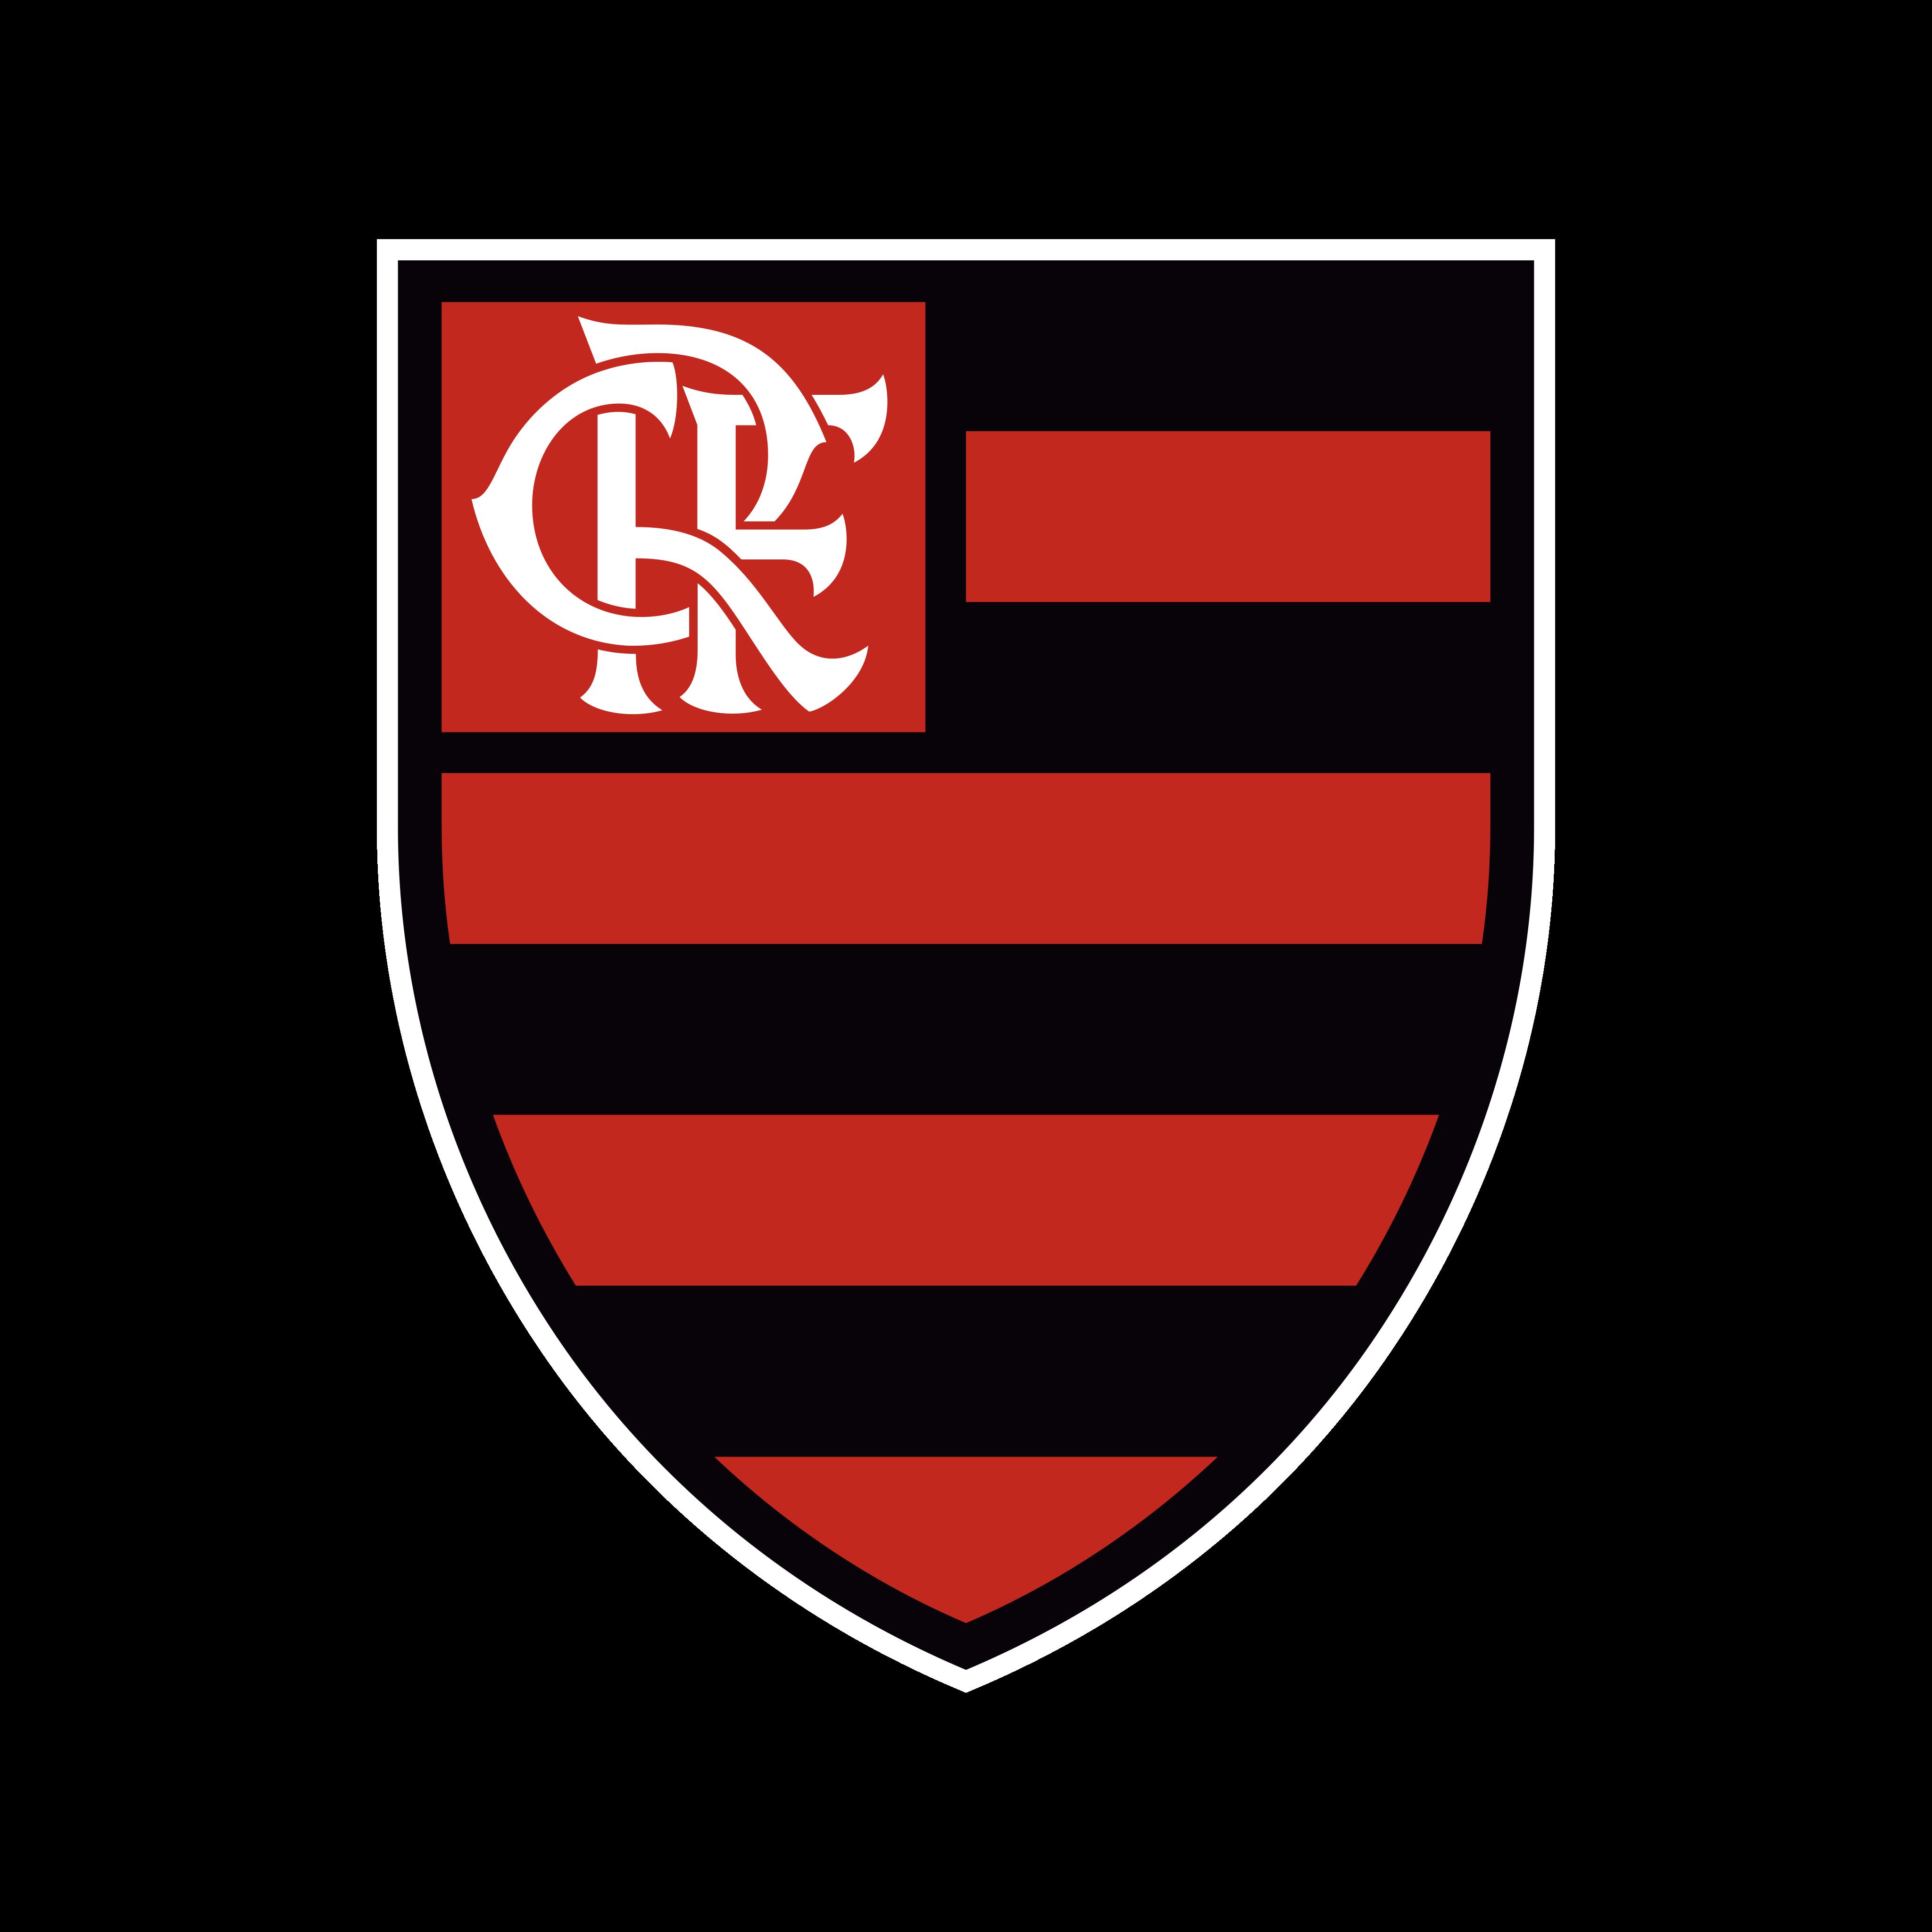 flamengo logo 0 - Flamengo Logo - Flamengo Escudo